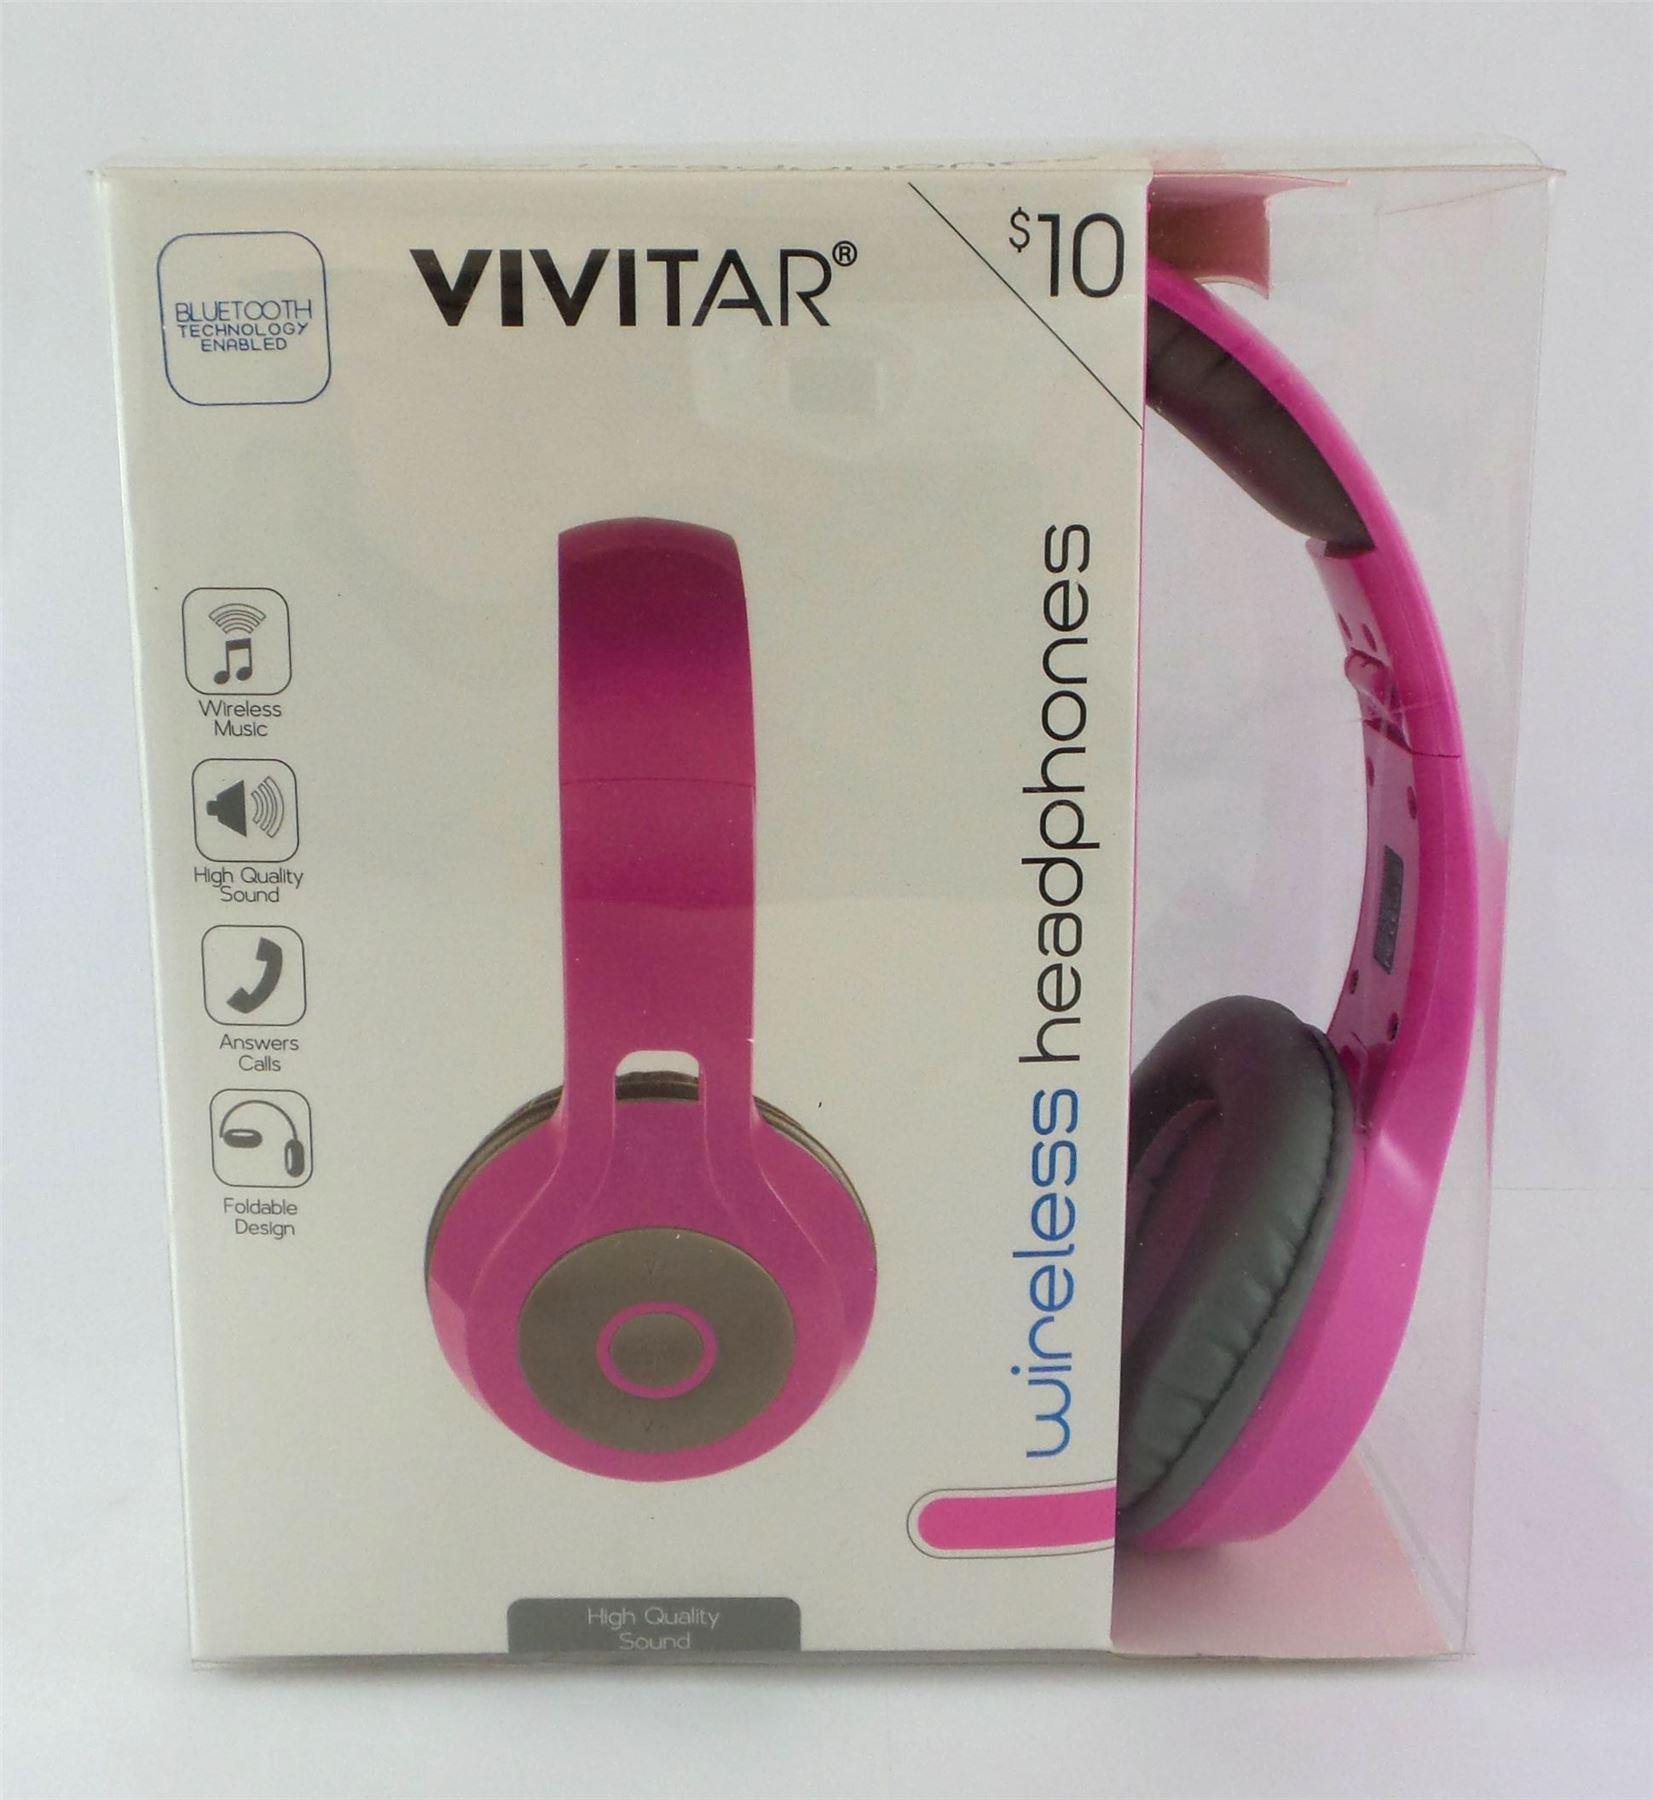 b9816f76083 Vivitar Bluetooth Wireless Stereo Headphones with Mic Foldable Pink  BH-C26-PNK